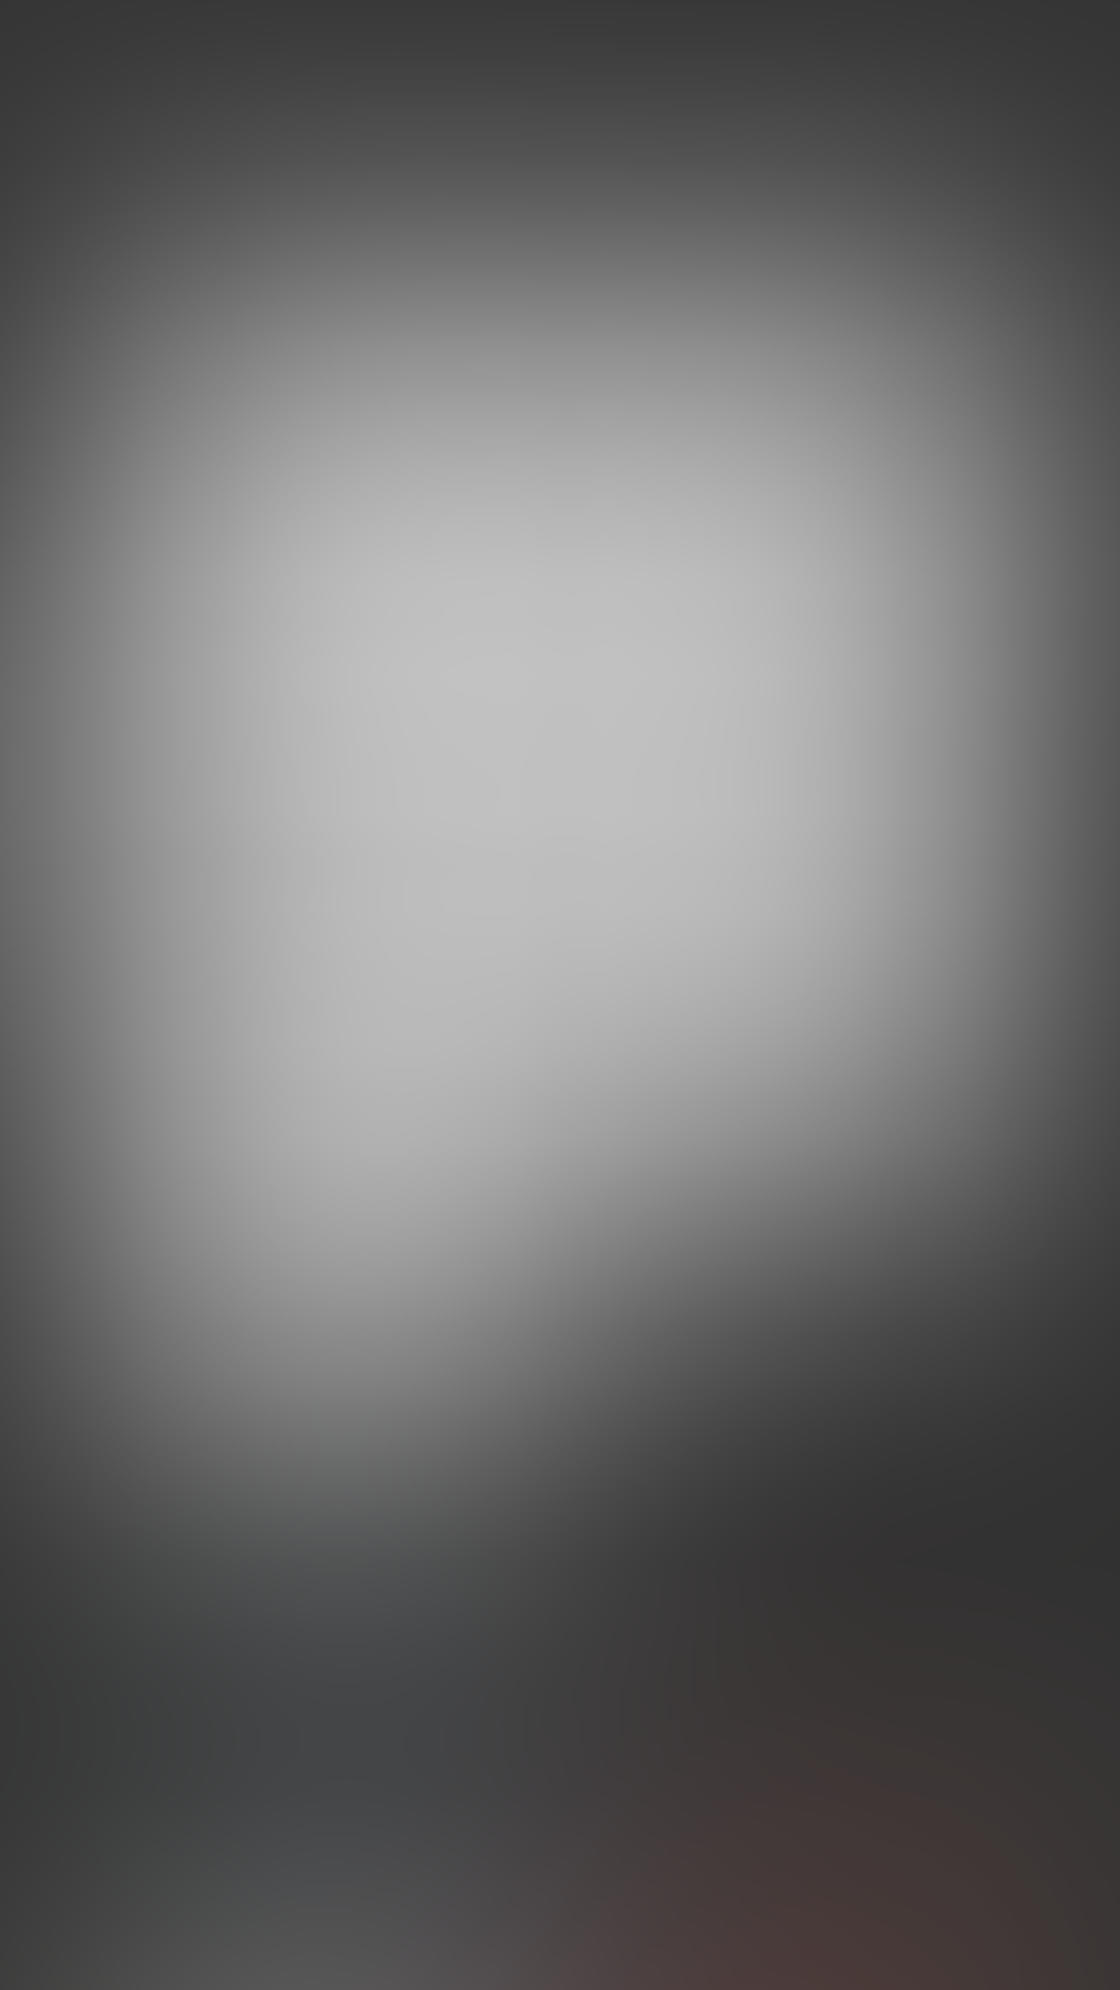 Black & White iPhone Portrait Photos 26